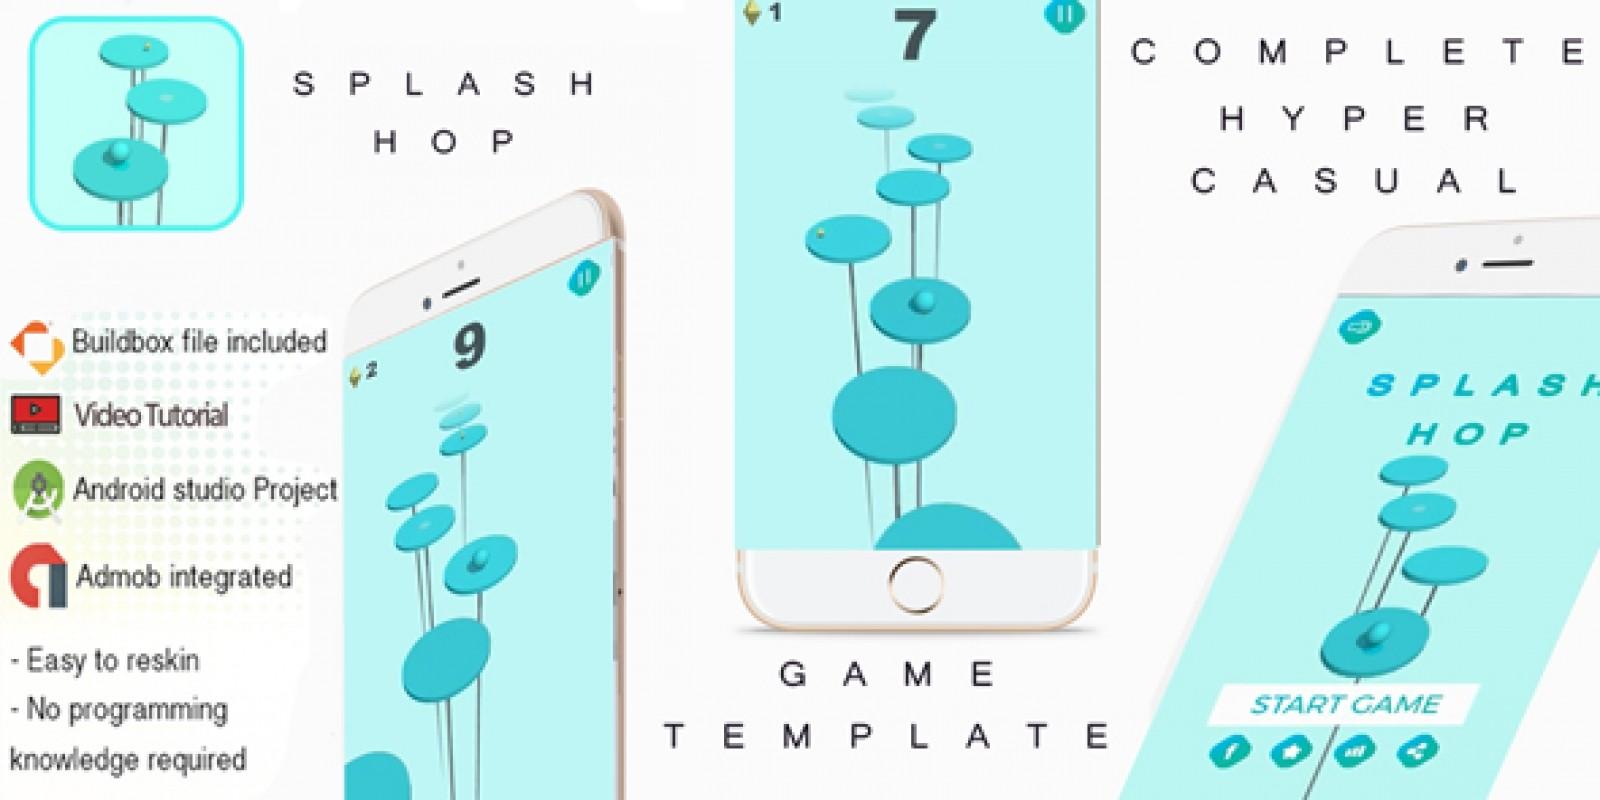 Splash Hop Buildbox 3 Template With Admob